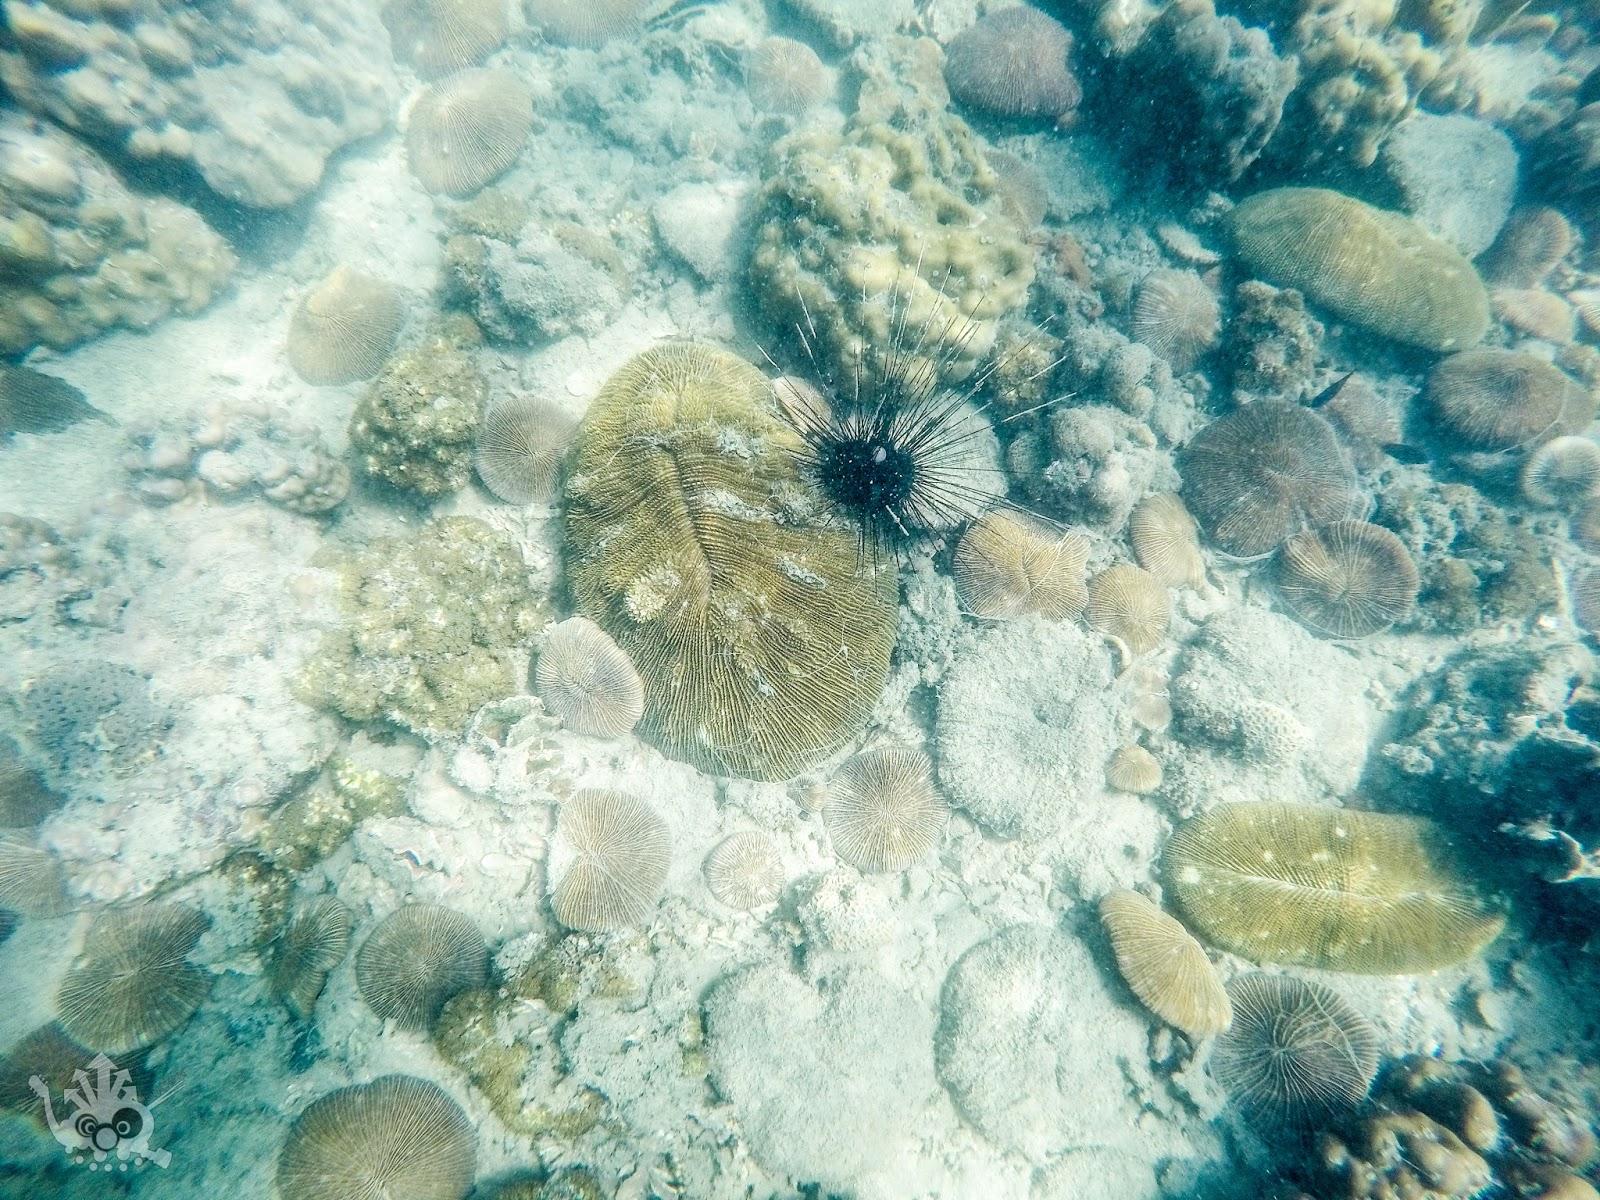 relationship between zooxanthellae coral polyps on rocks